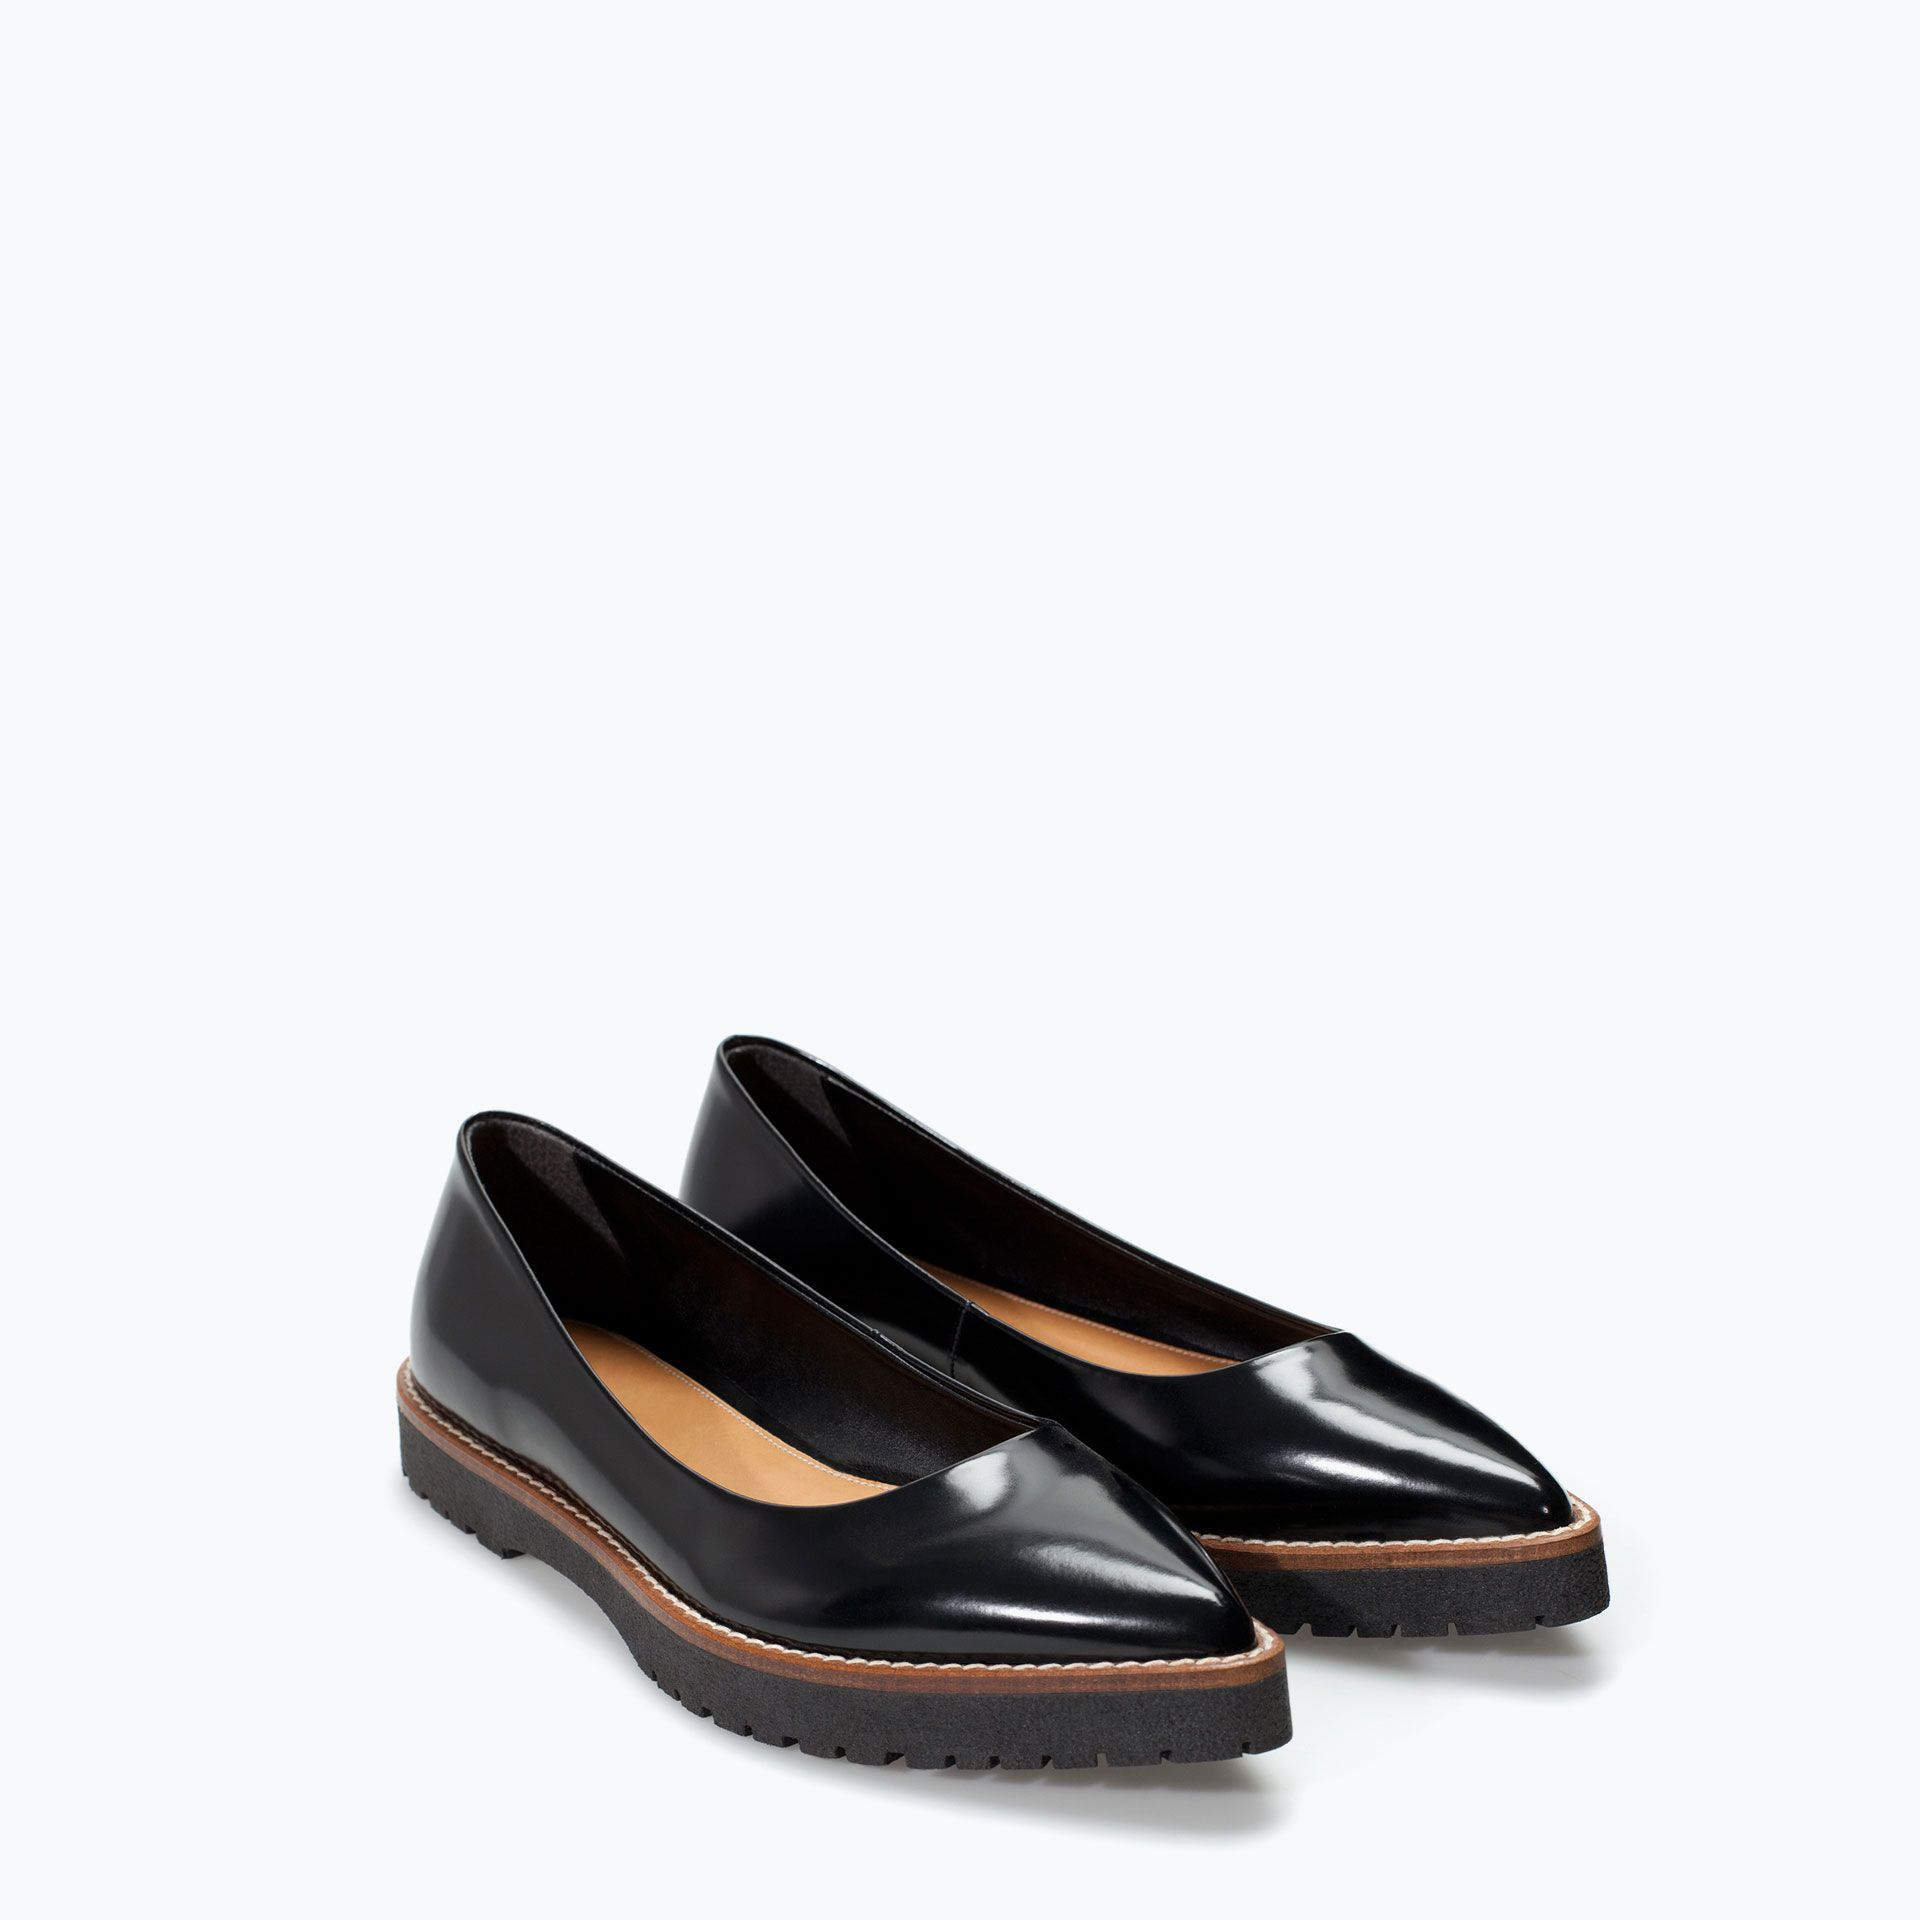 {TRACK SOLE BALLET FLAT from Zara in black - under $75}